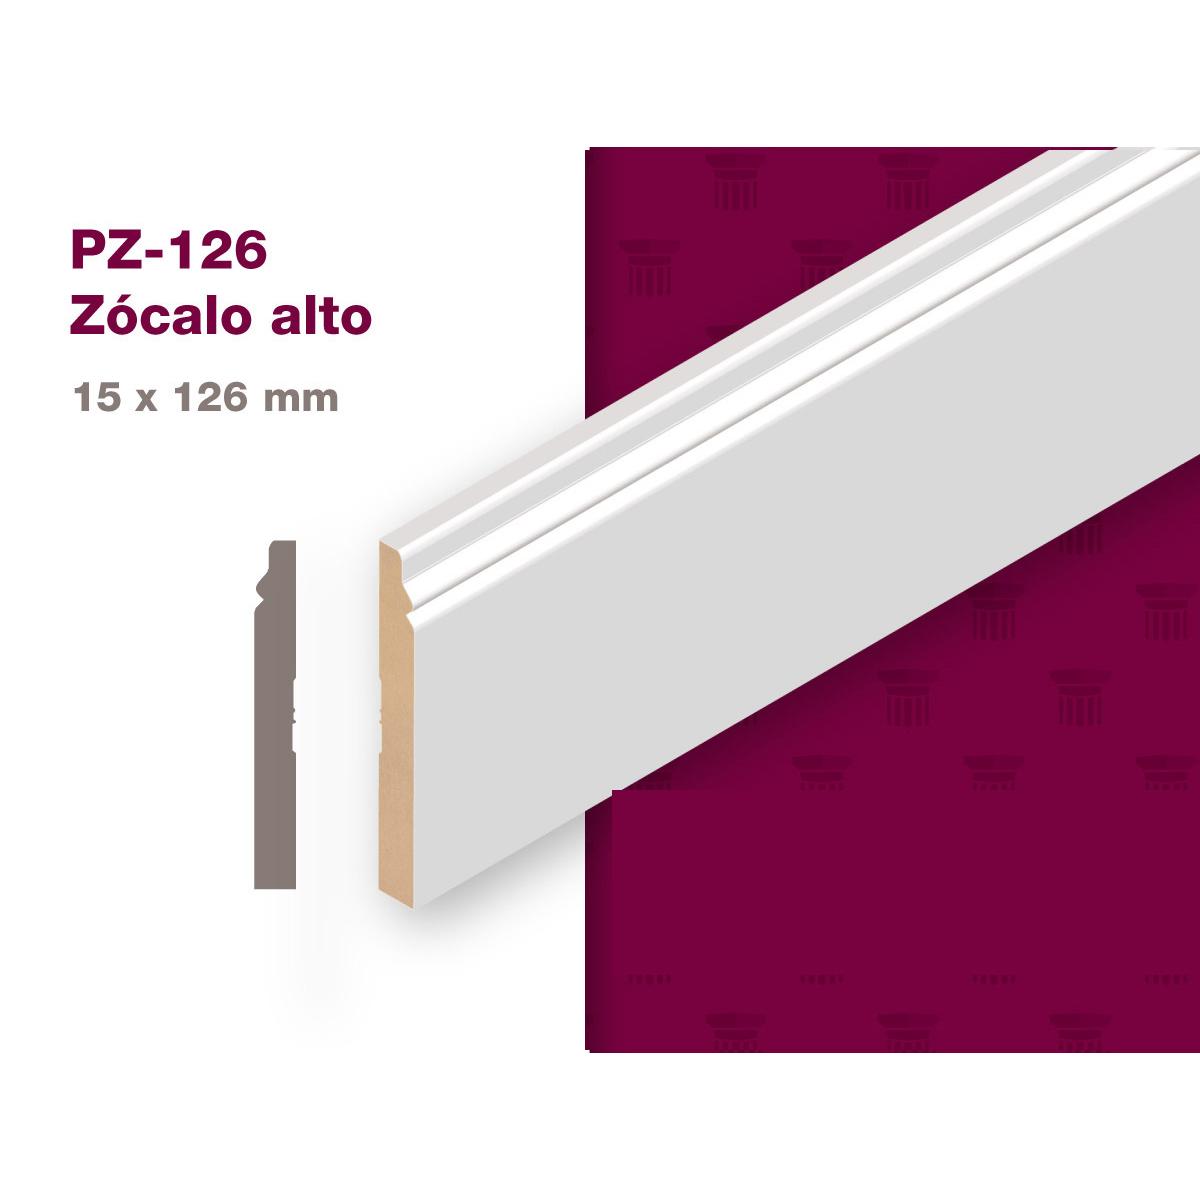 ZOCALO MDF PREPINTADO 15X126x2.75MTS PZ-126